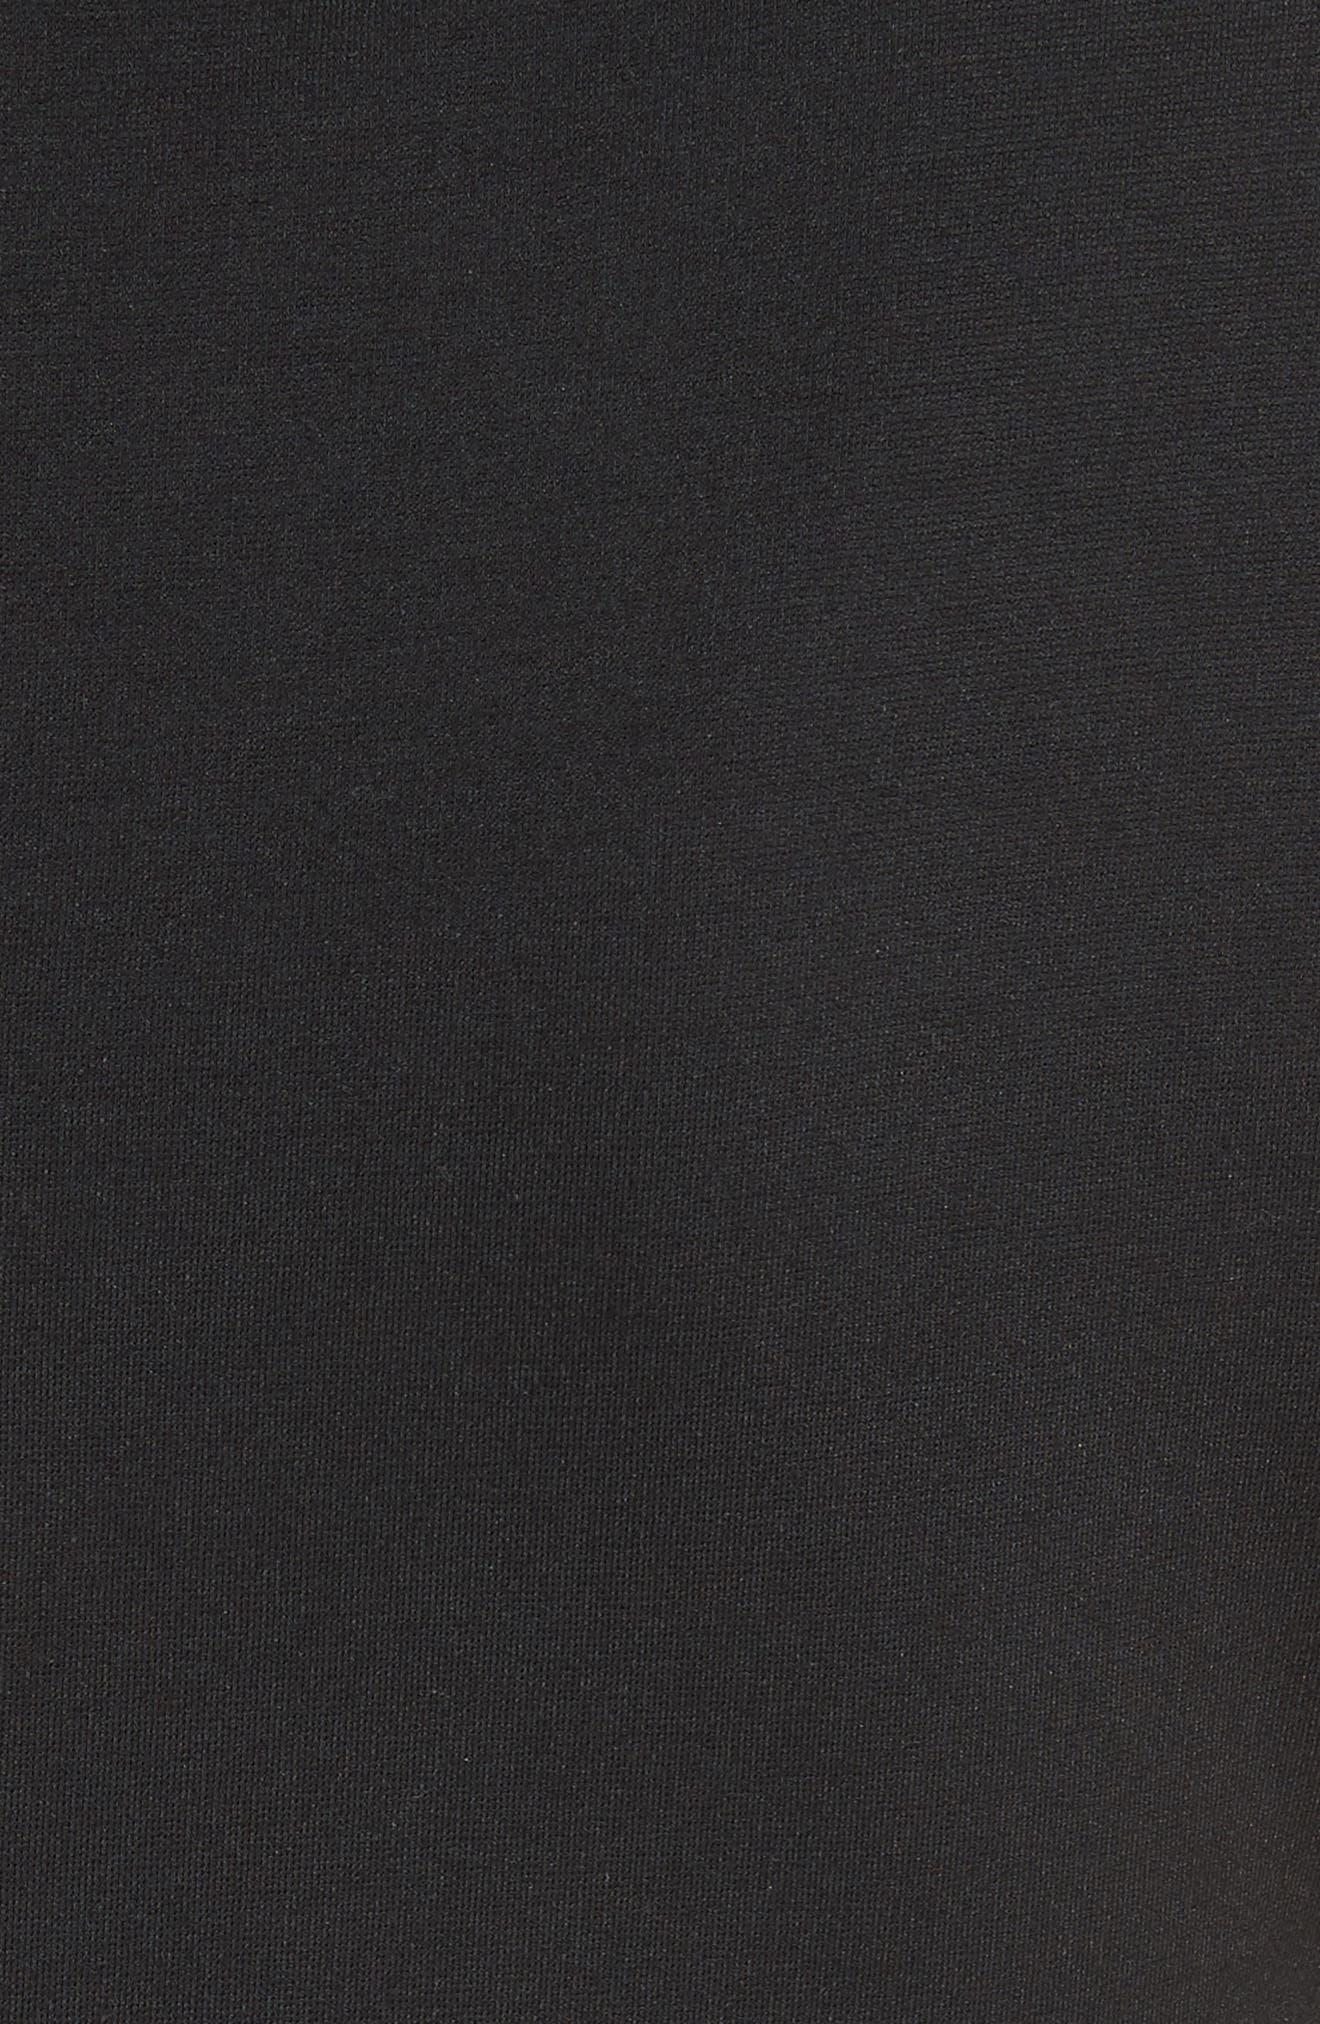 KATE SPADE NEW YORK,                             ponte fiorella fit & flare dress,                             Alternate thumbnail 6, color,                             BLACK